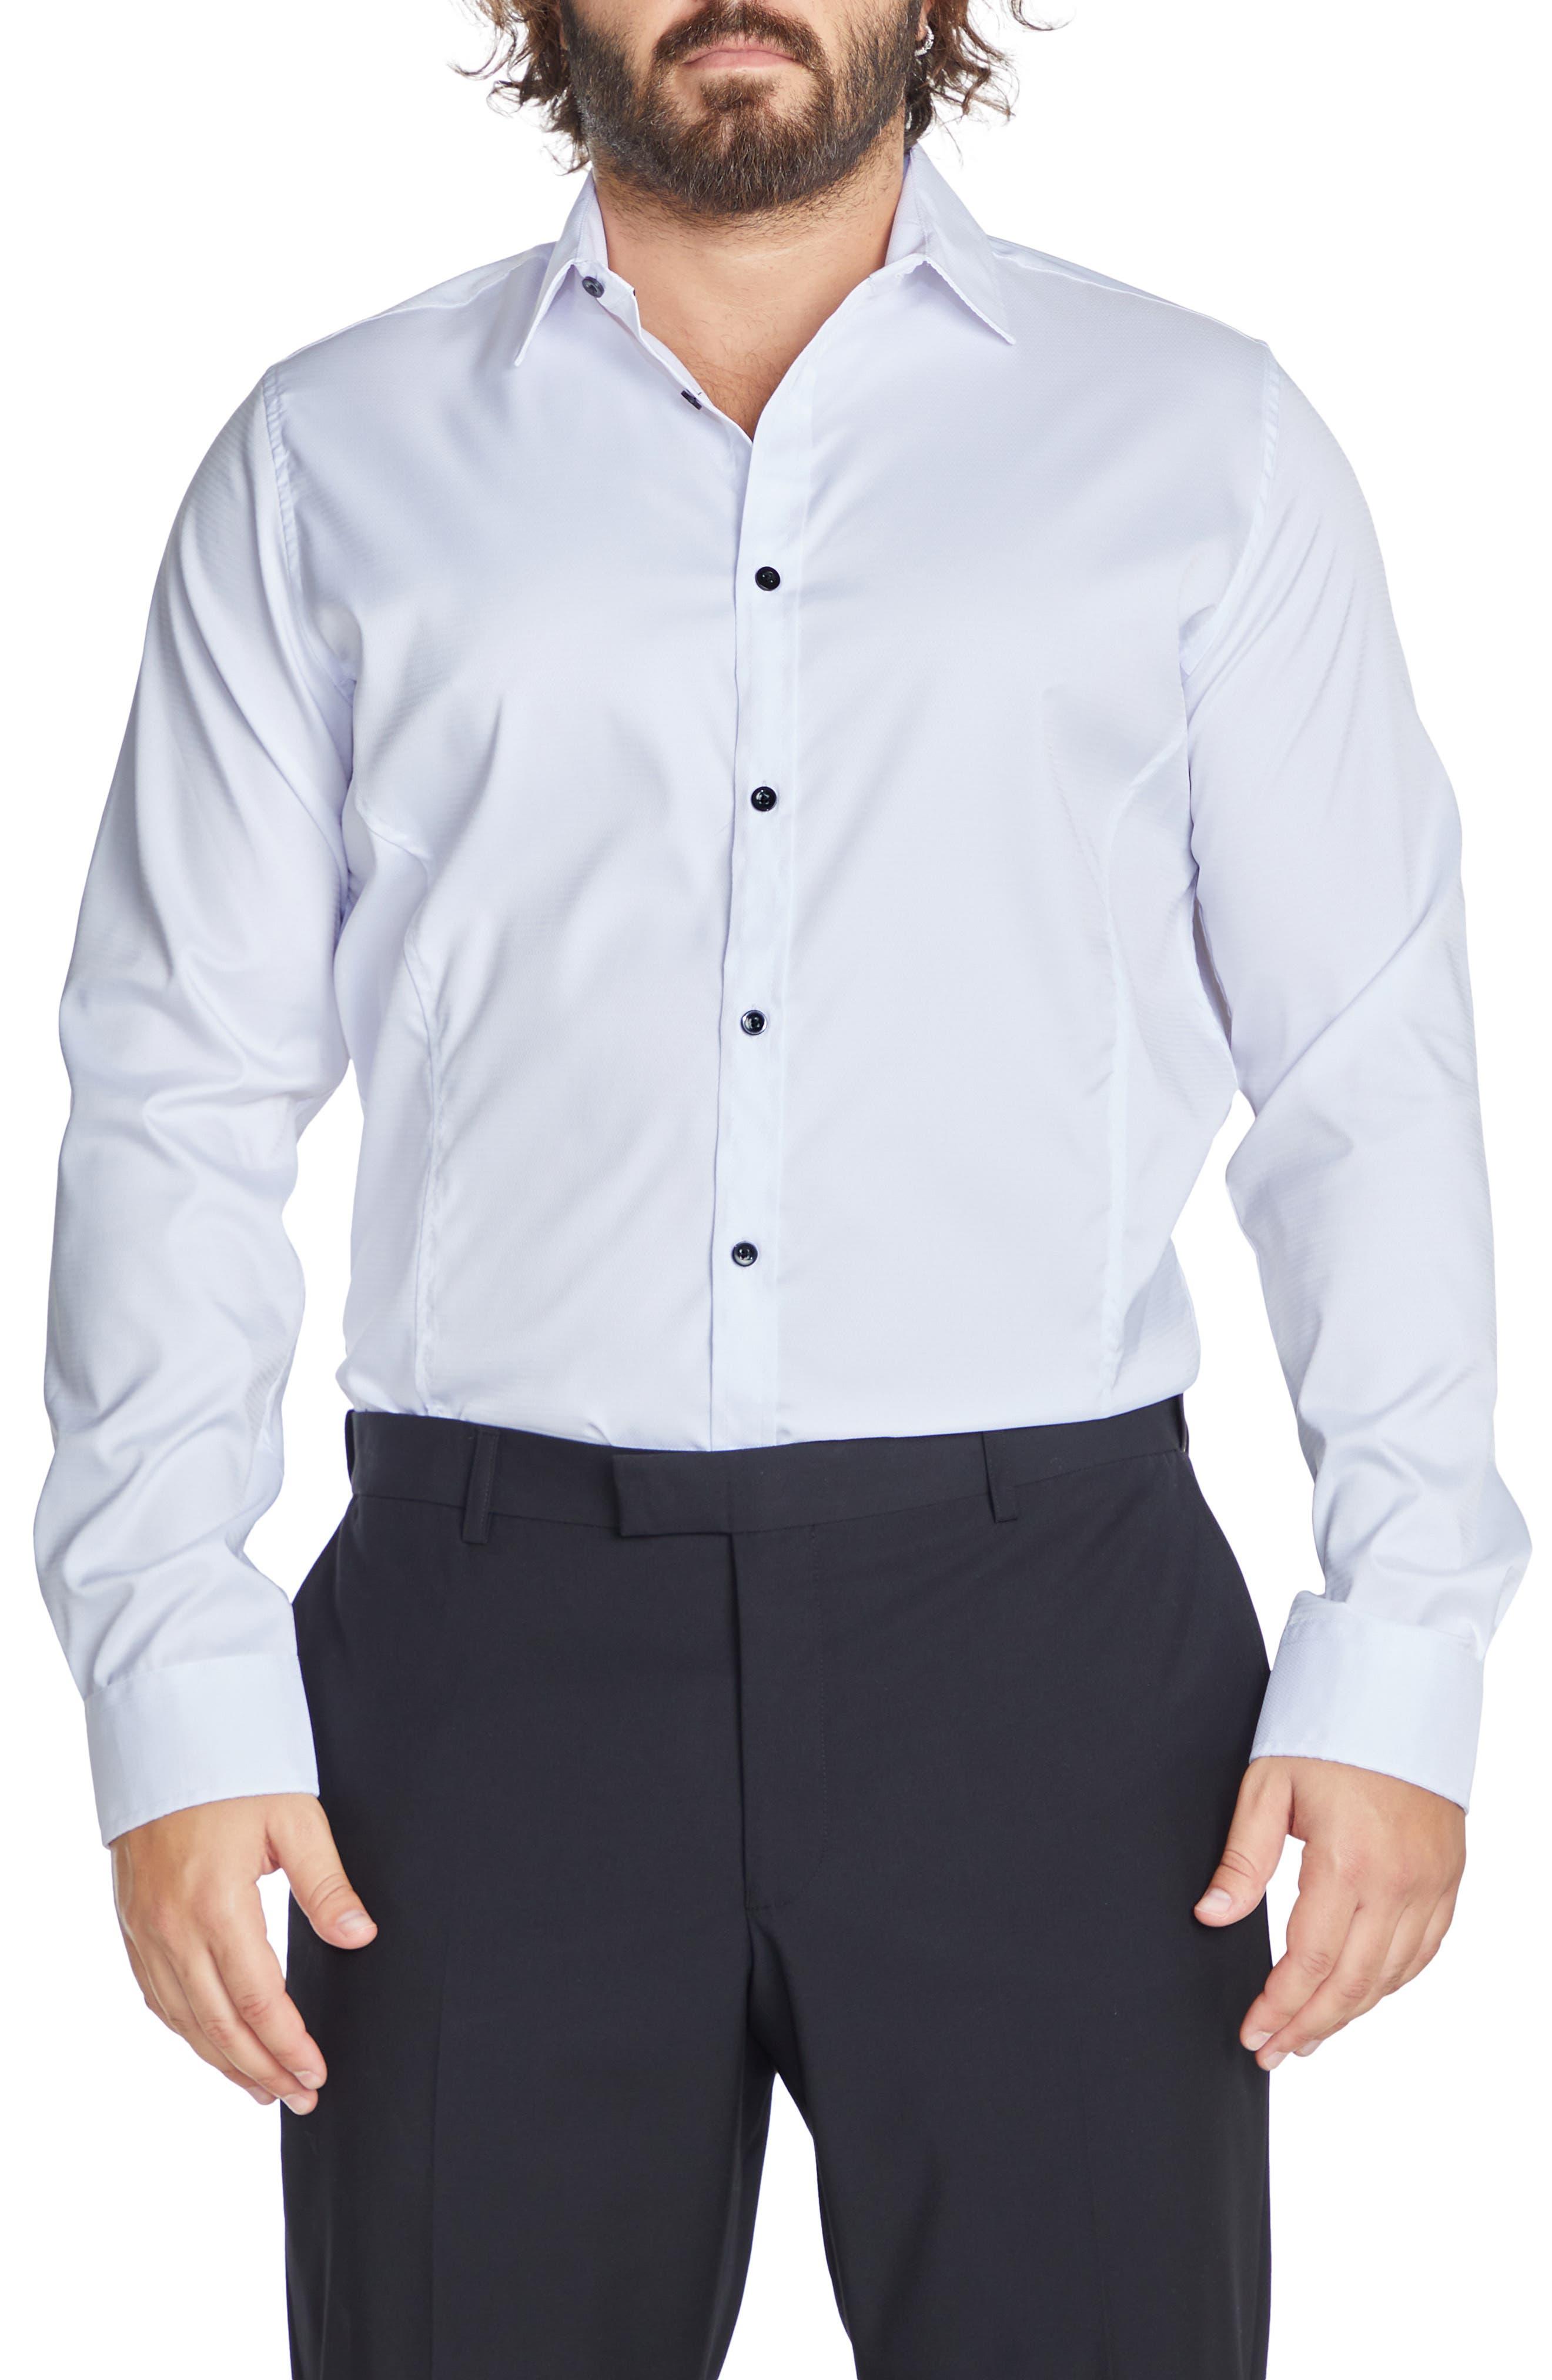 Bahamas Regular Fit Solid Stretch Dress Shirt